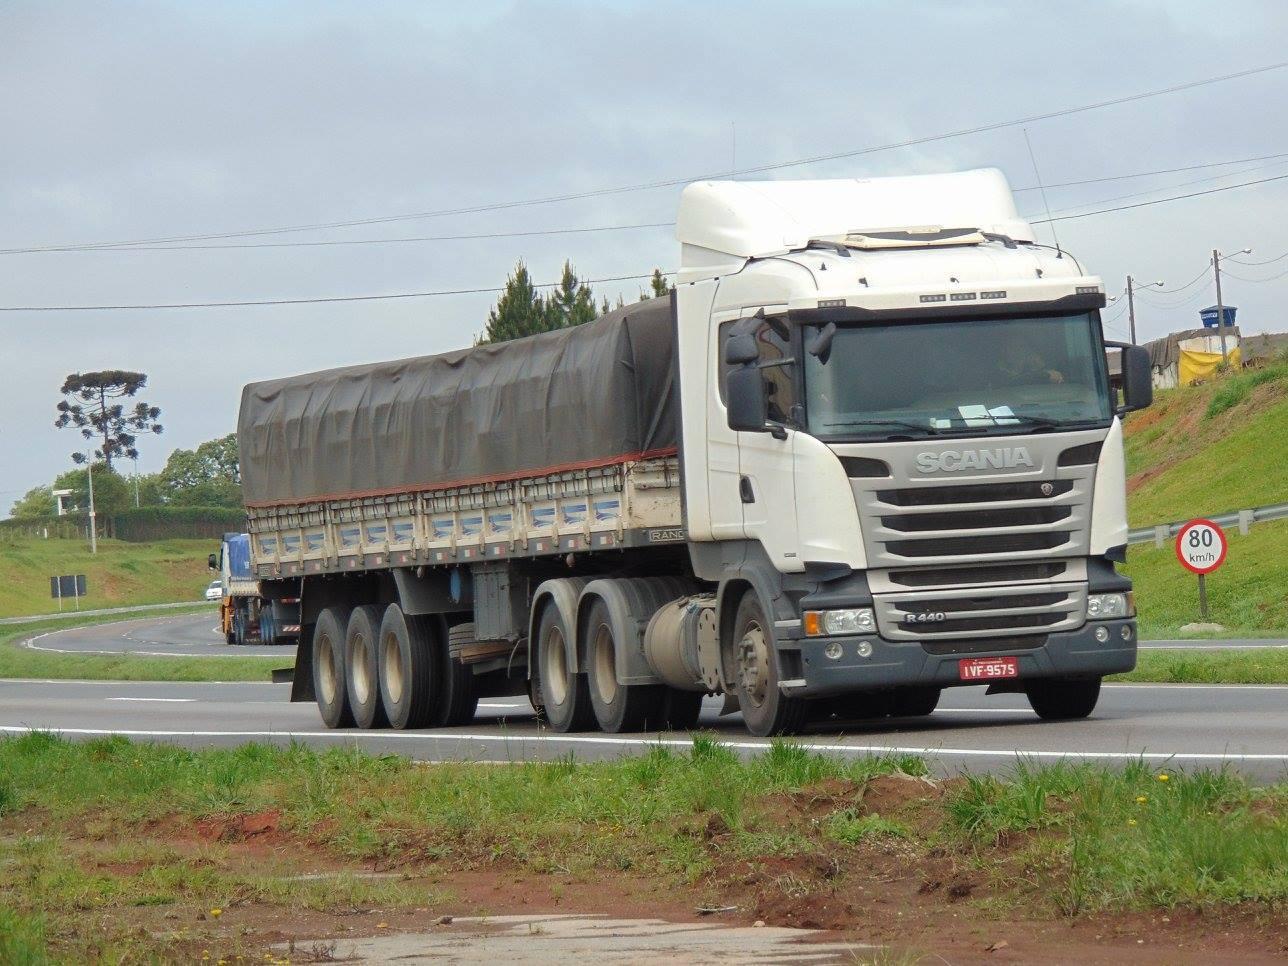 Scania-photo-5-1--2015-31